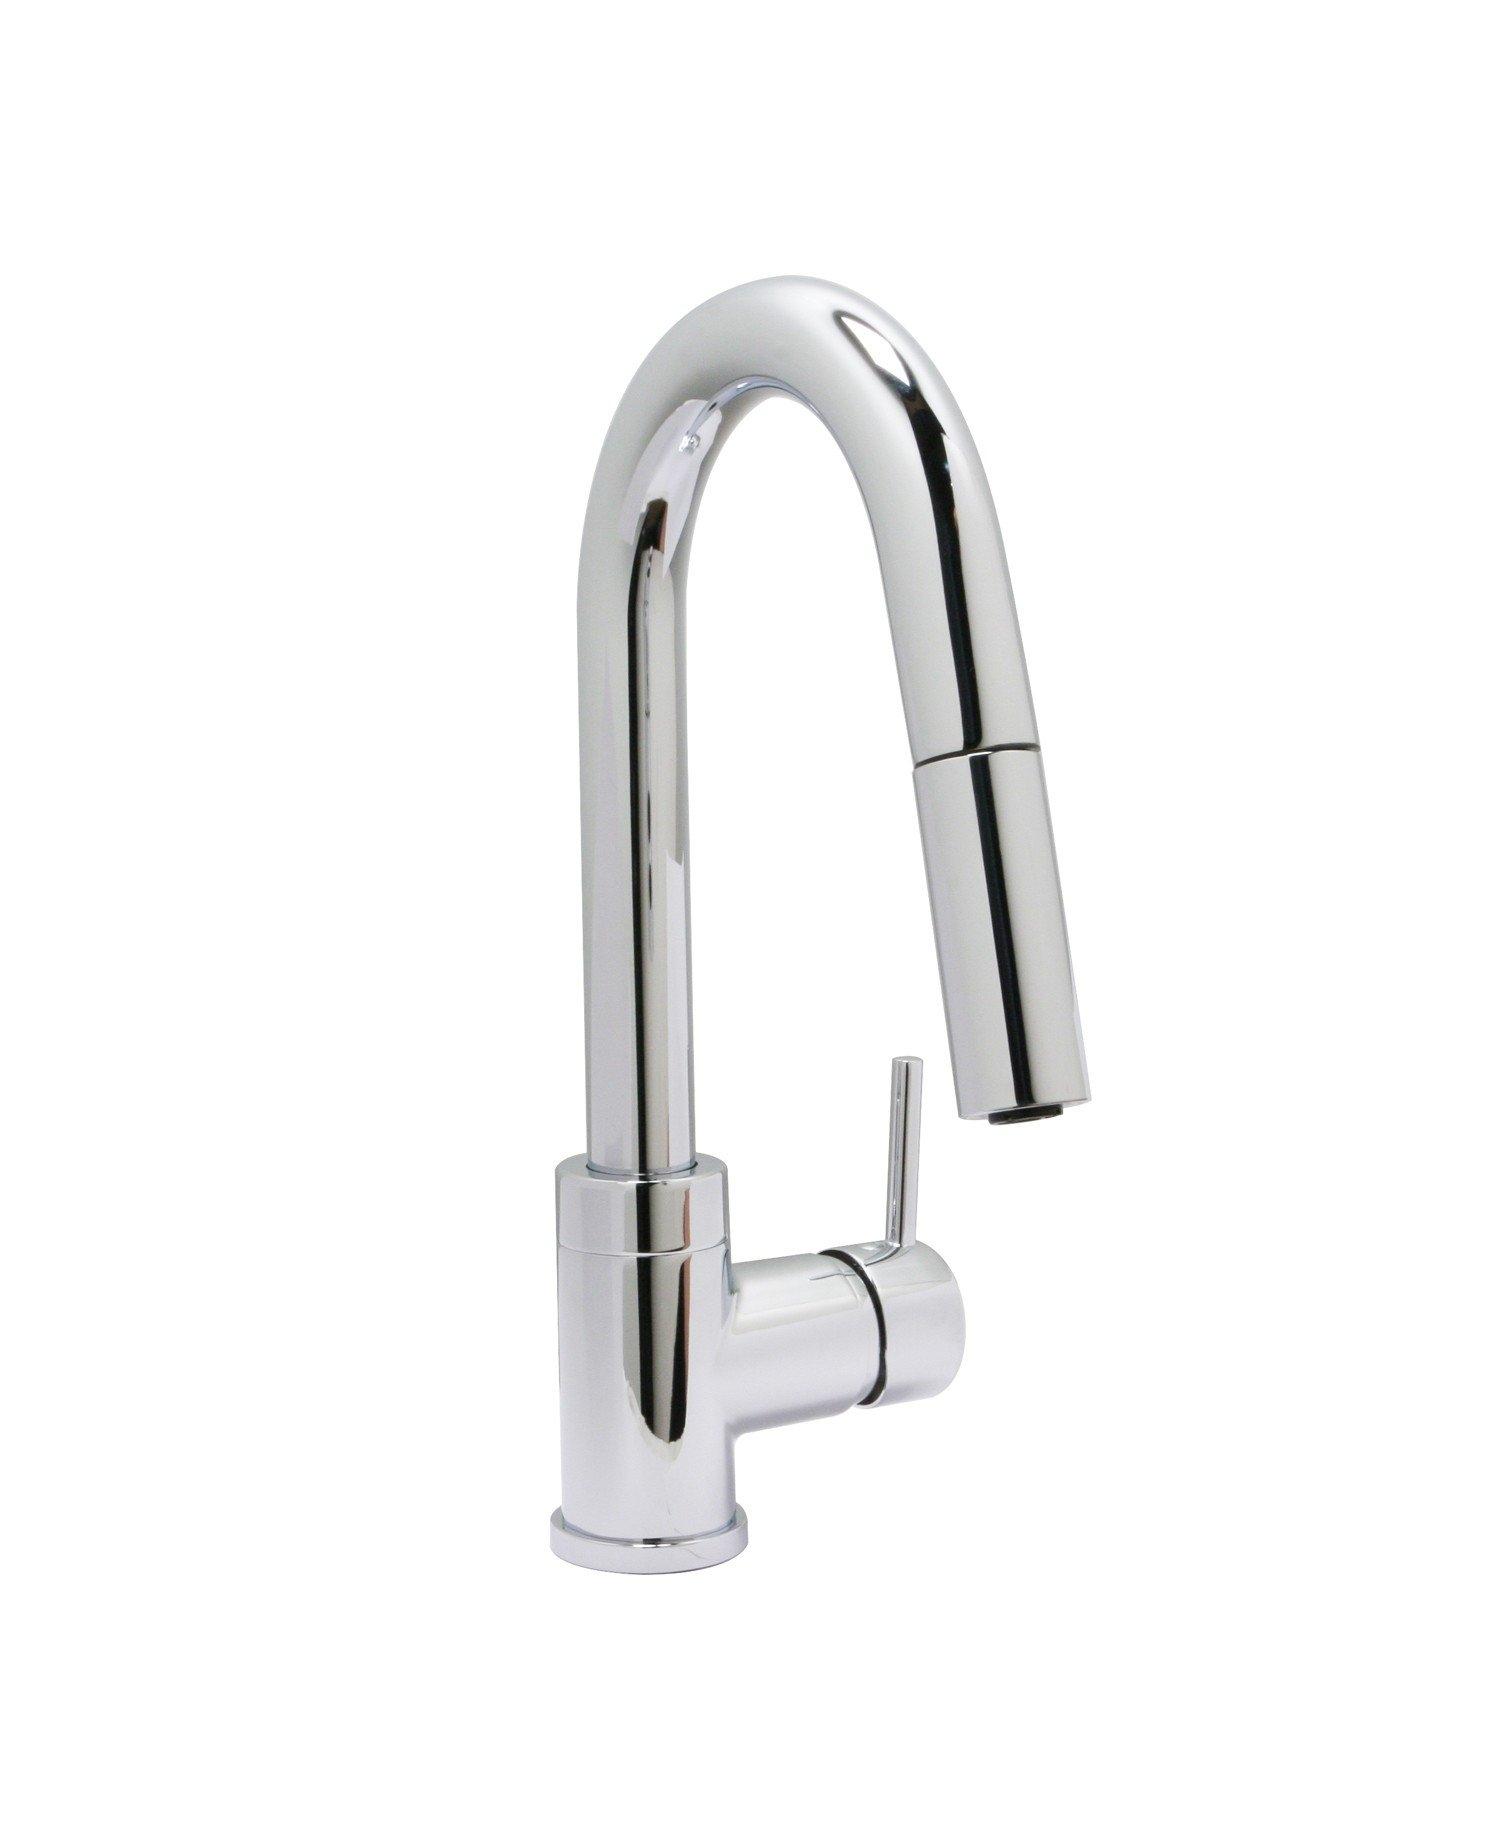 Ideas, bar prep sink faucets bar prep sink faucets barprep faucet k1823301 j 1500 x 1838  .